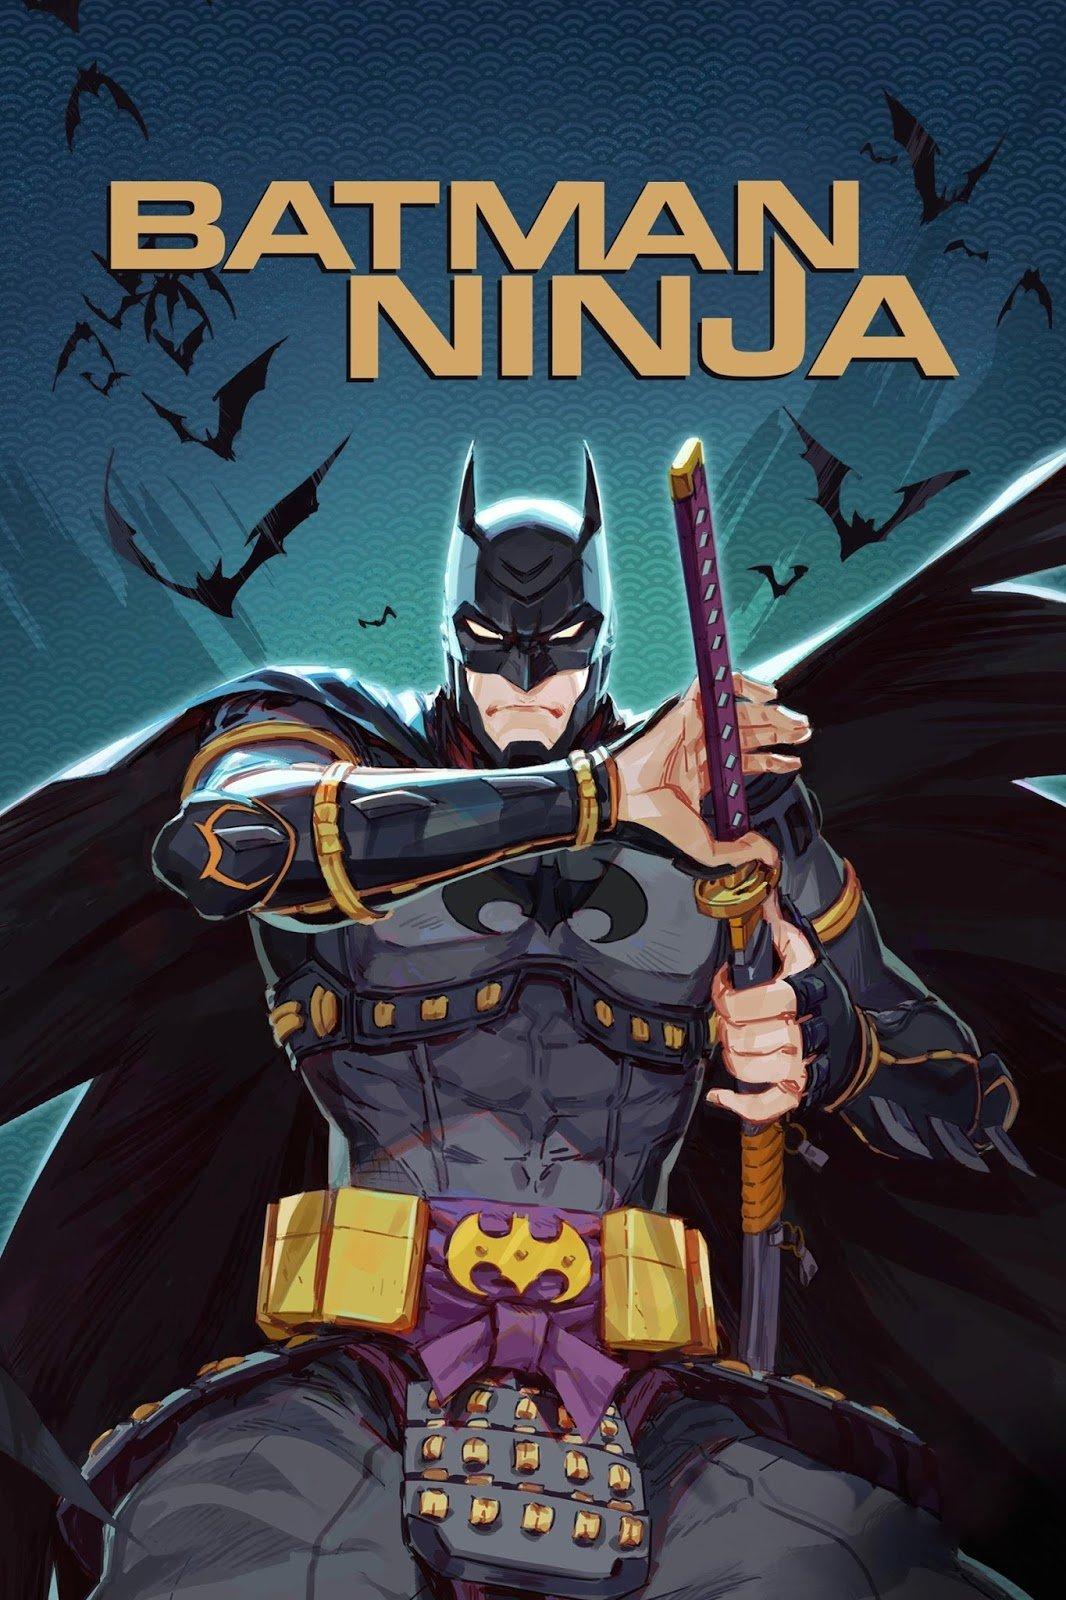 Batman Ninja (2018) แบทแมนนินจา (ซับไทย)